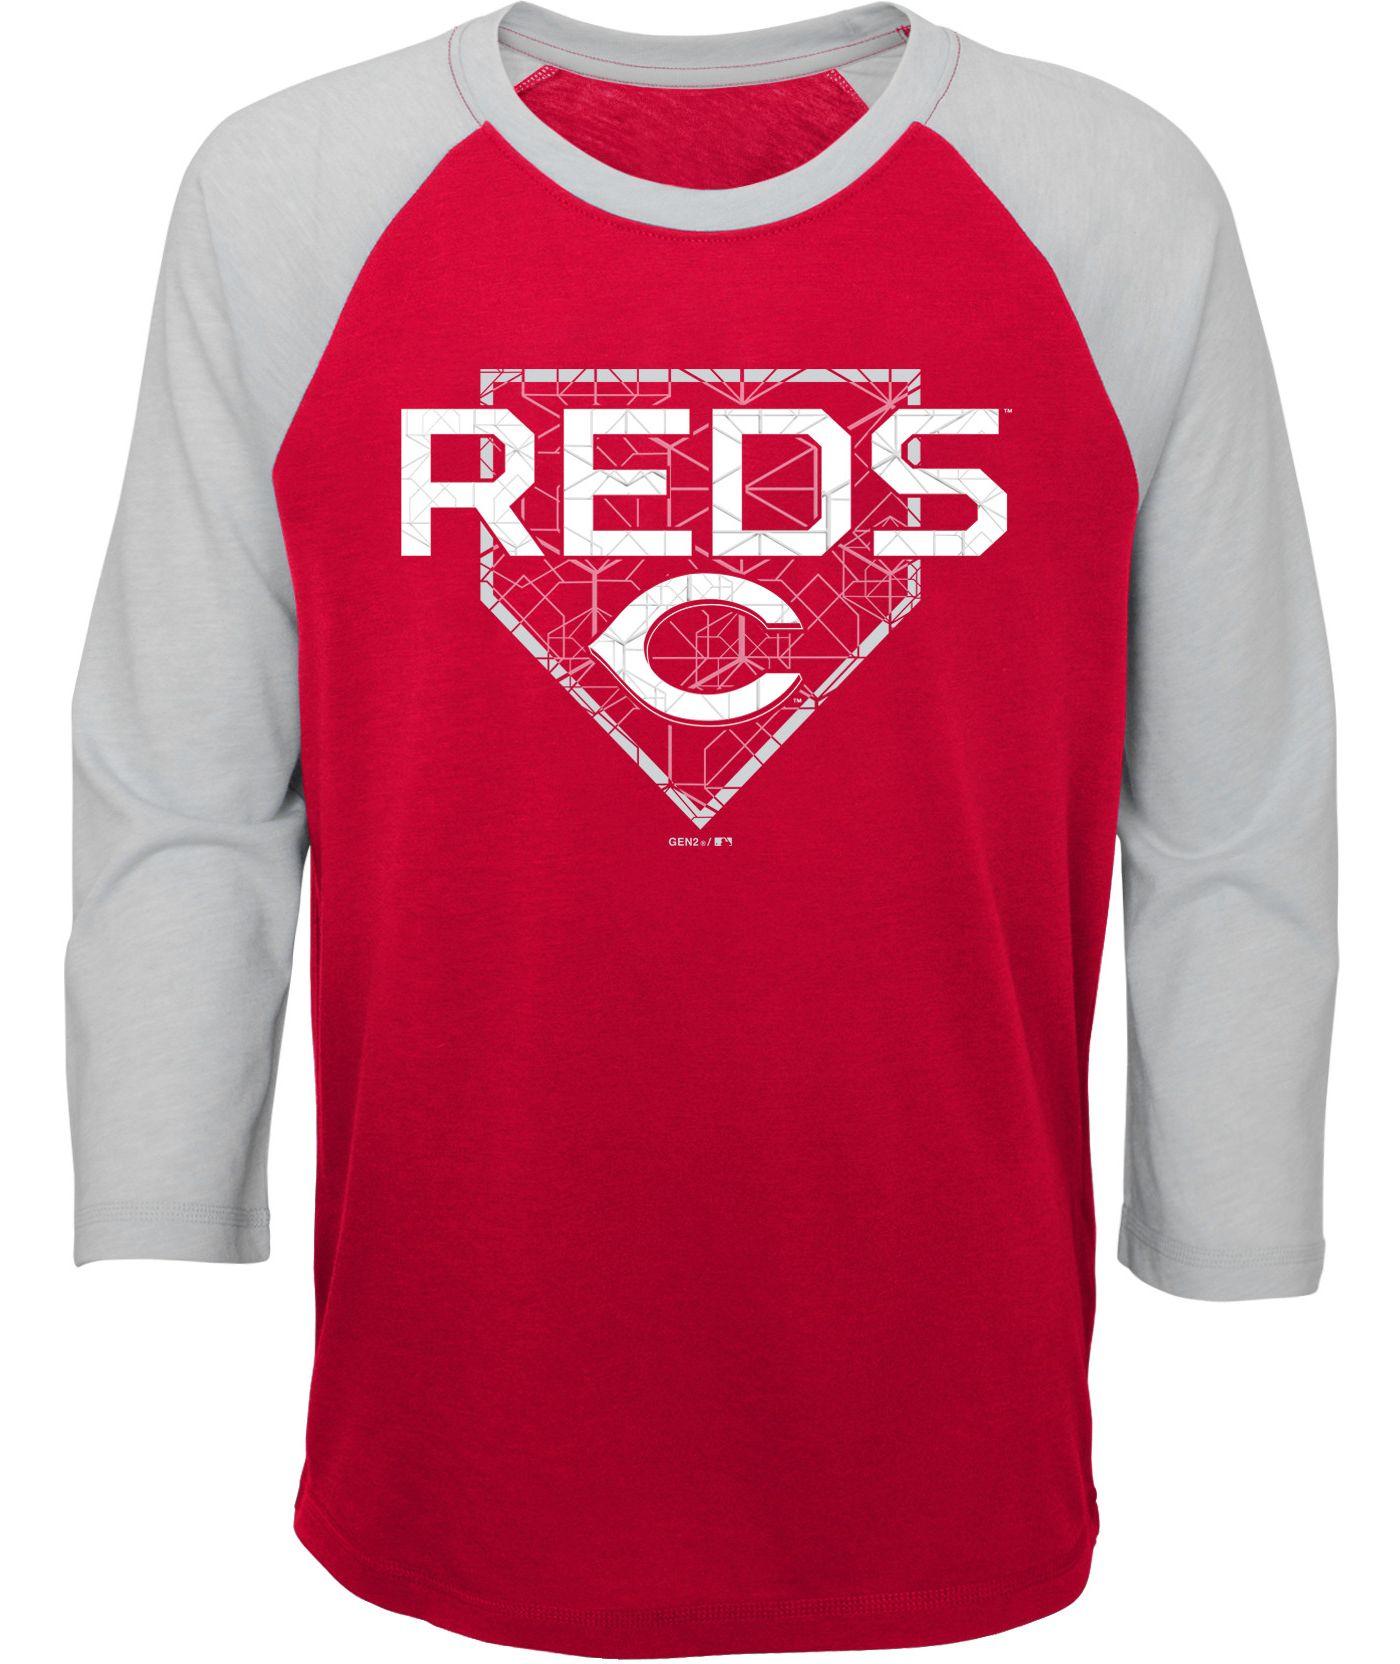 Gen2 Youth Cincinnati Reds Three-Quarter Sleeve Shirt